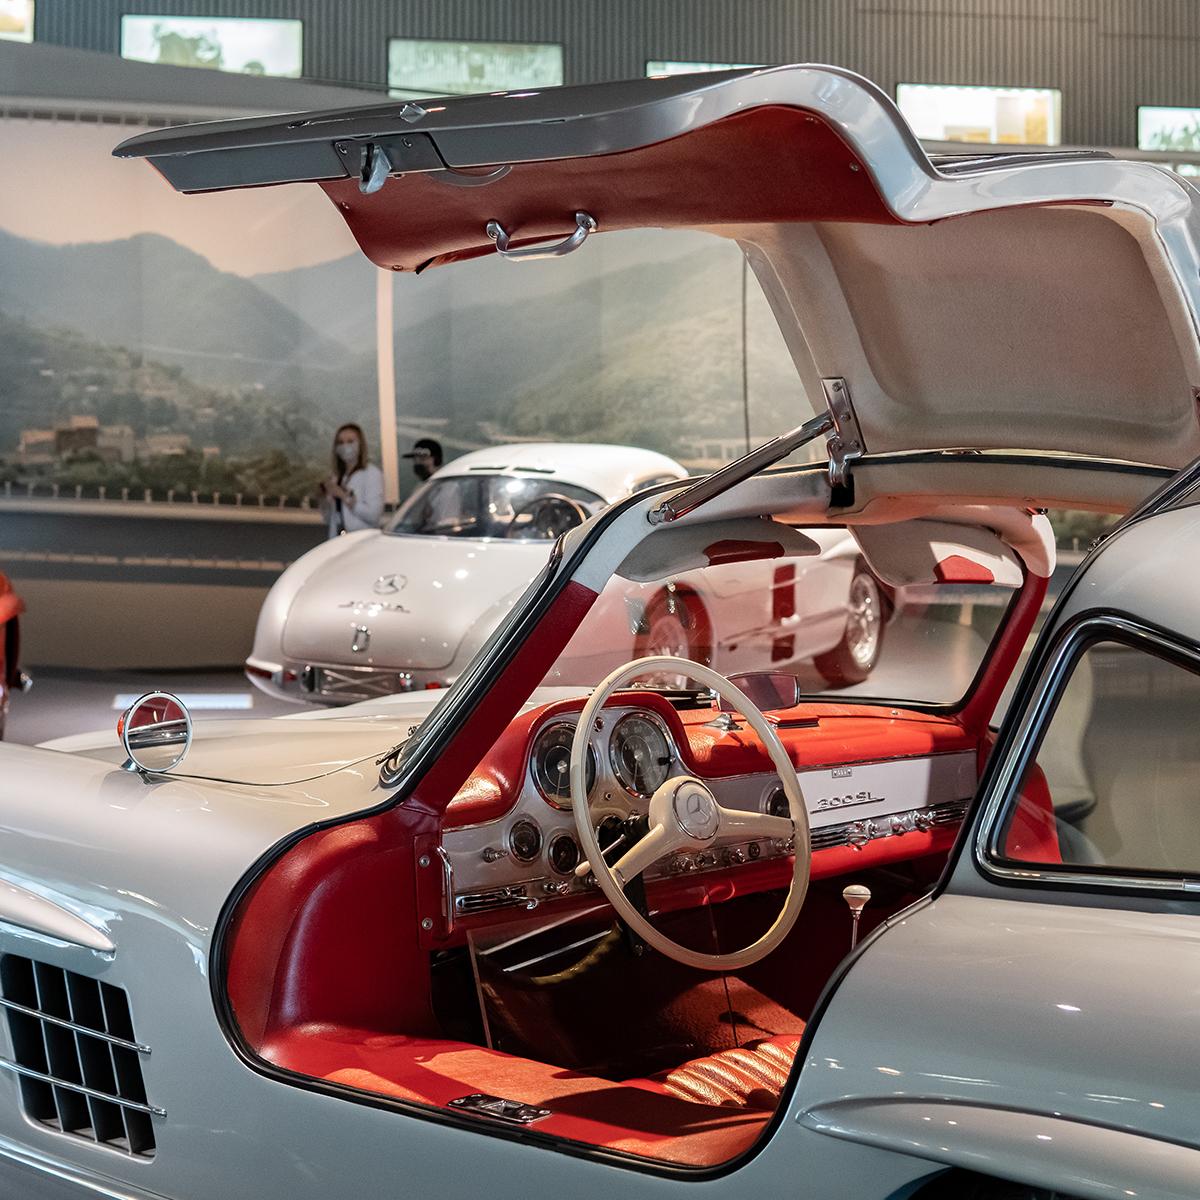 Zamanının yakışıklı sporcularından Mercedes 300 SL...  #Koluman #MercedesBenz #tbt #throwbackthursday #mercedesbenzclassic #MBClassic #300SL